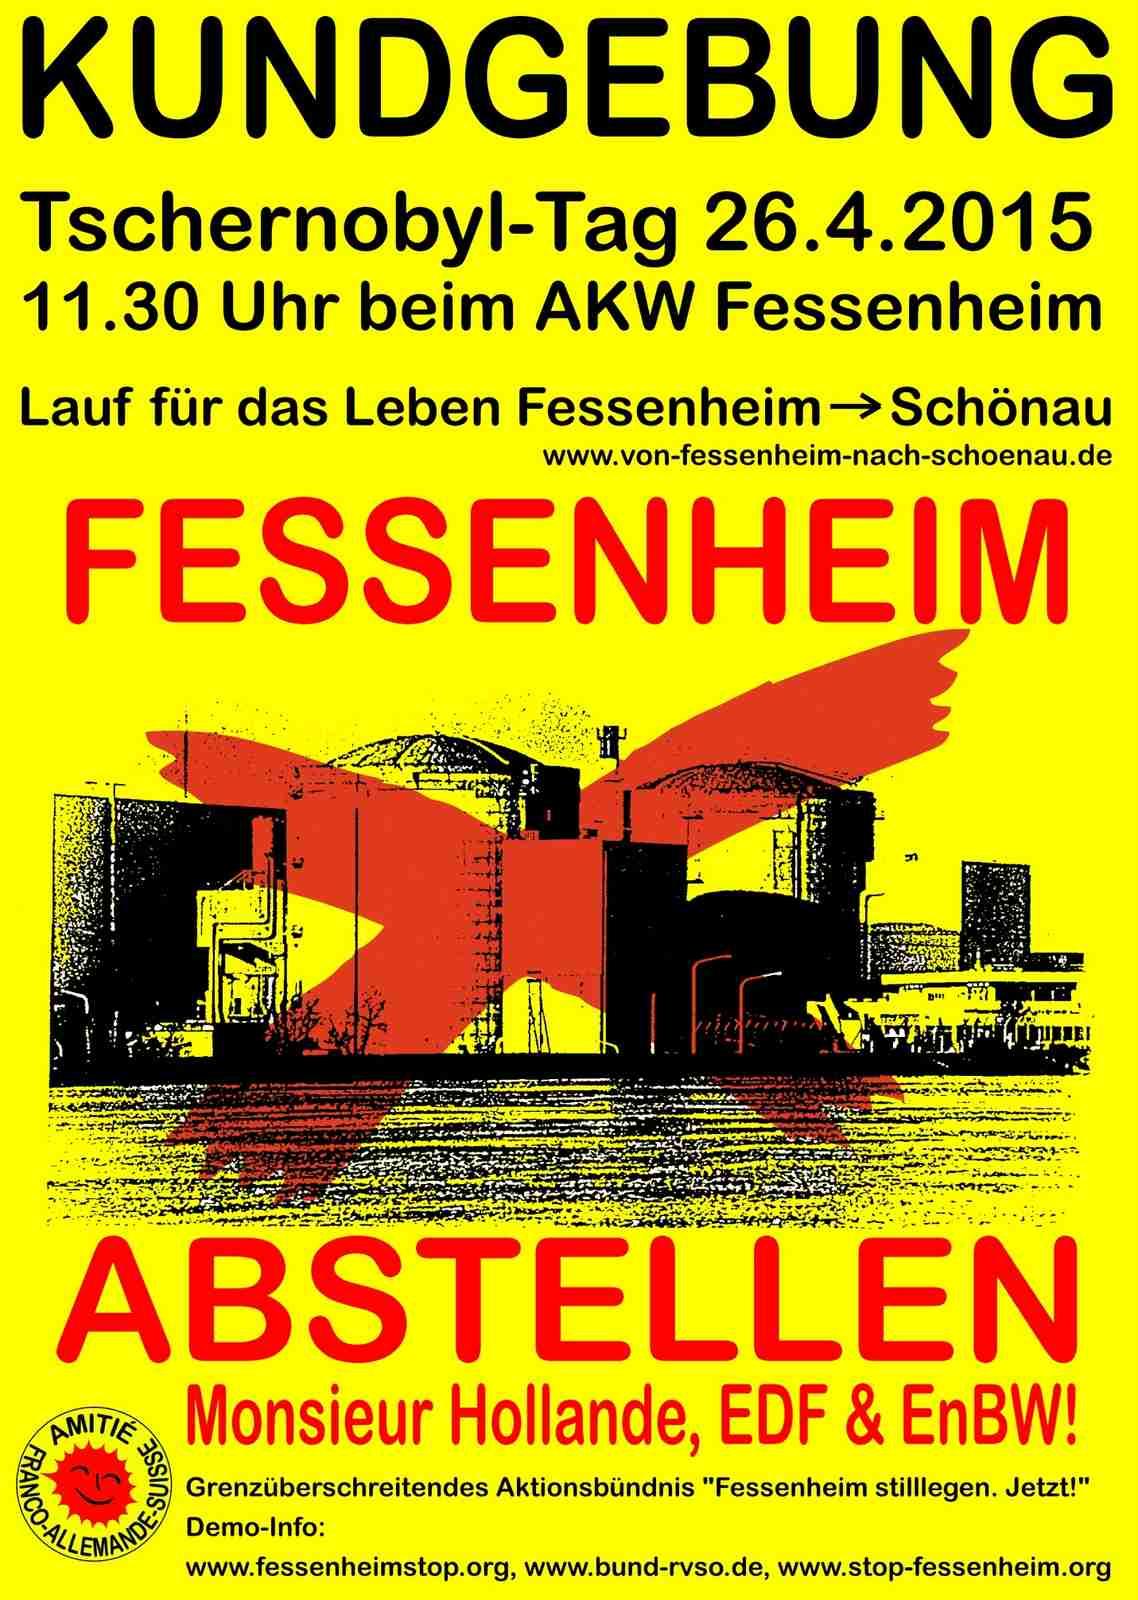 Fessenheim abstellen A3-Seite001-001 145kb